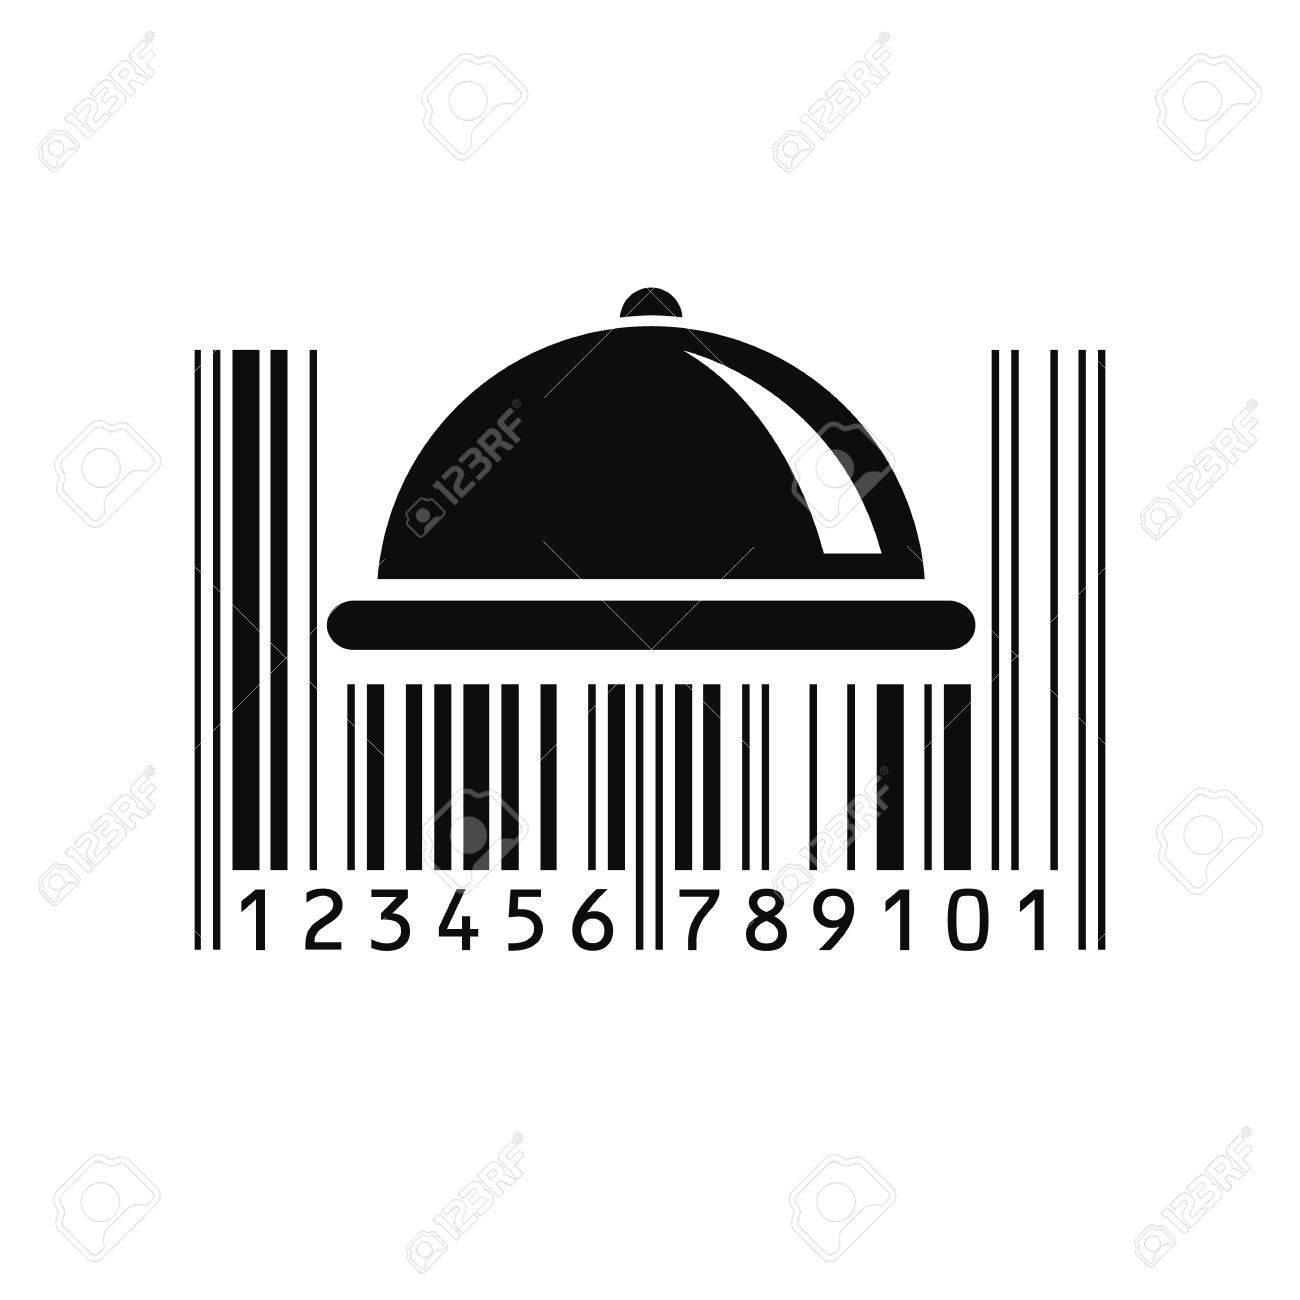 bar code vector illustration eps 10 barcode royalty free cliparts